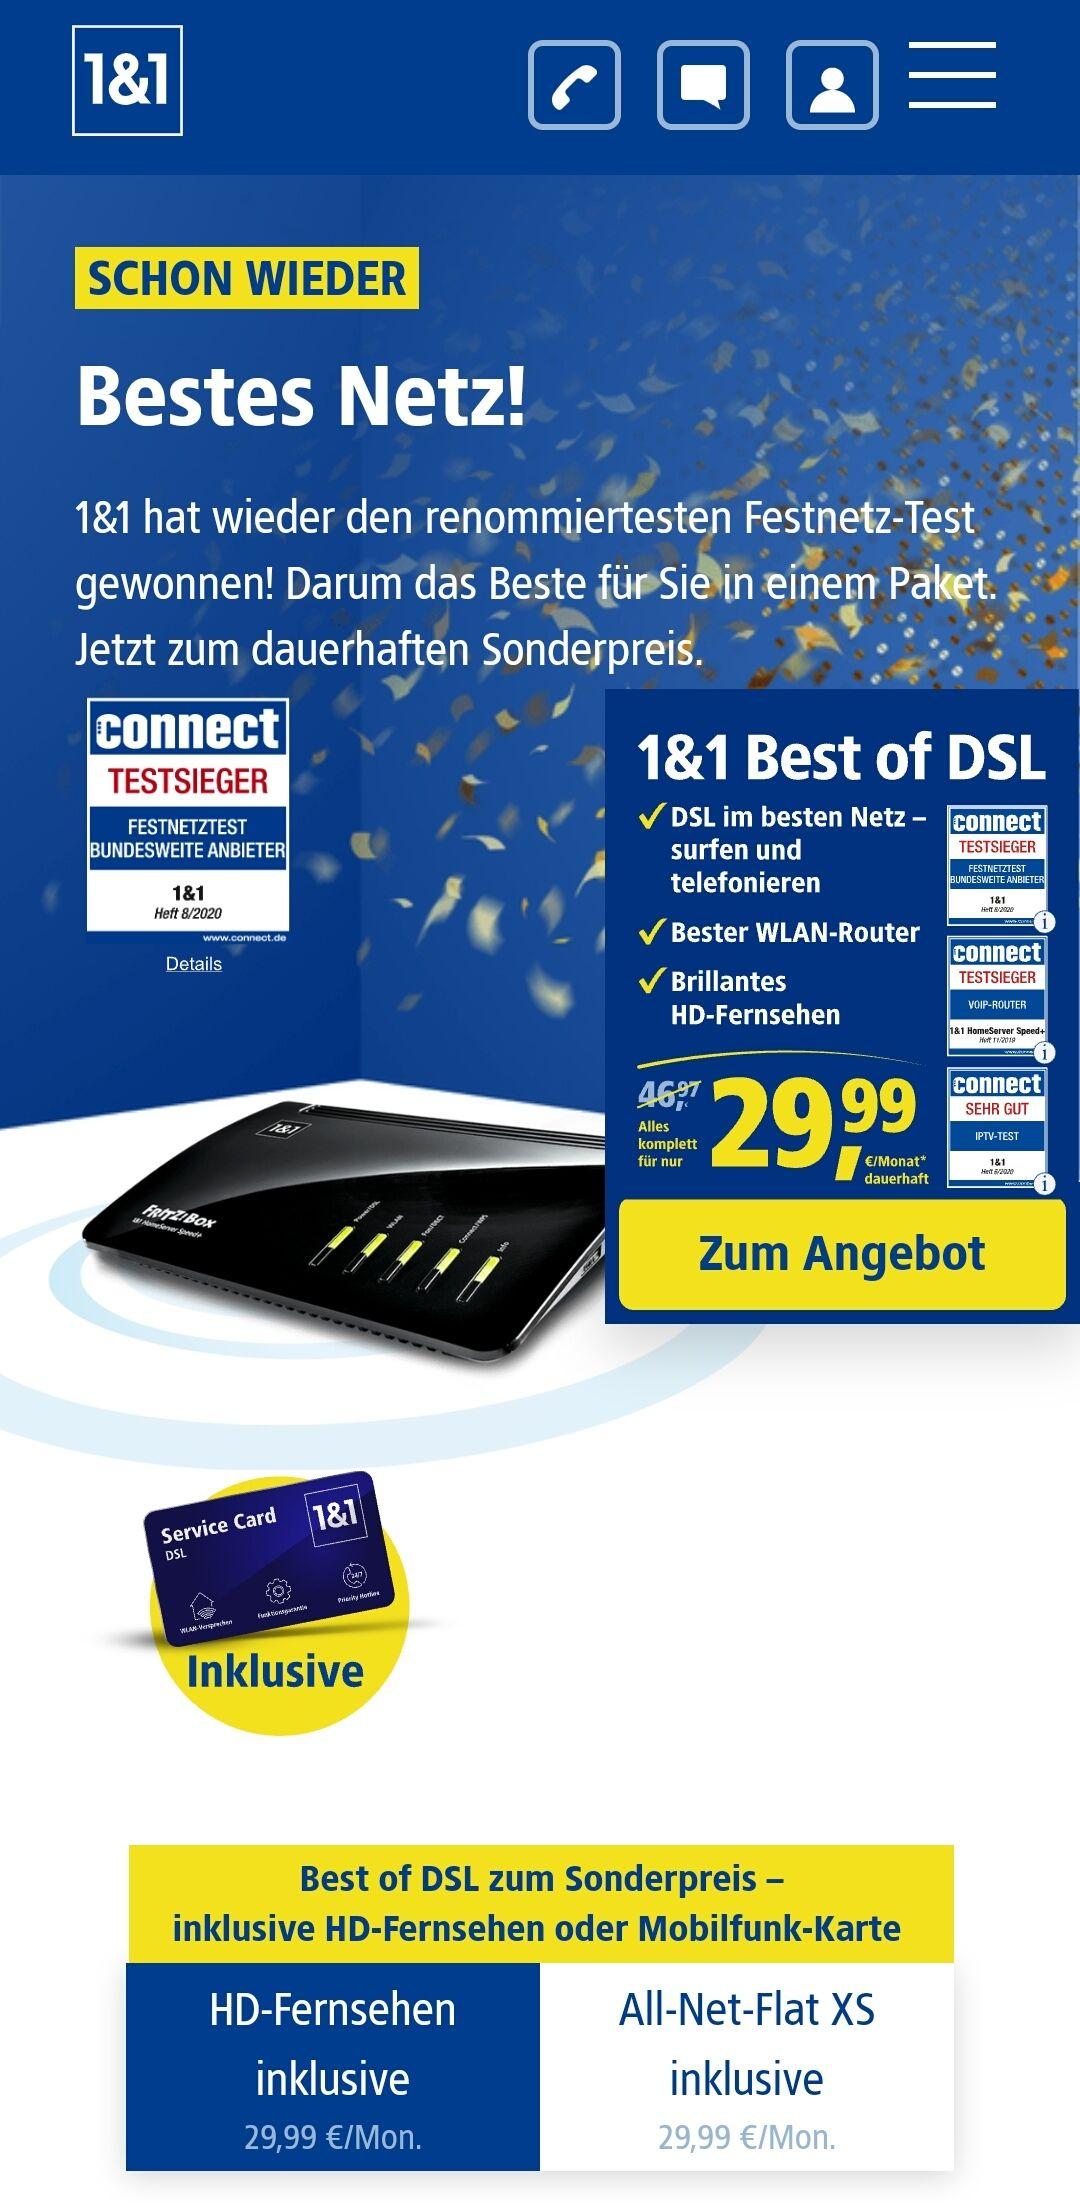 1und1 Best of DSL Deal 50Mbit inkl. HD TV